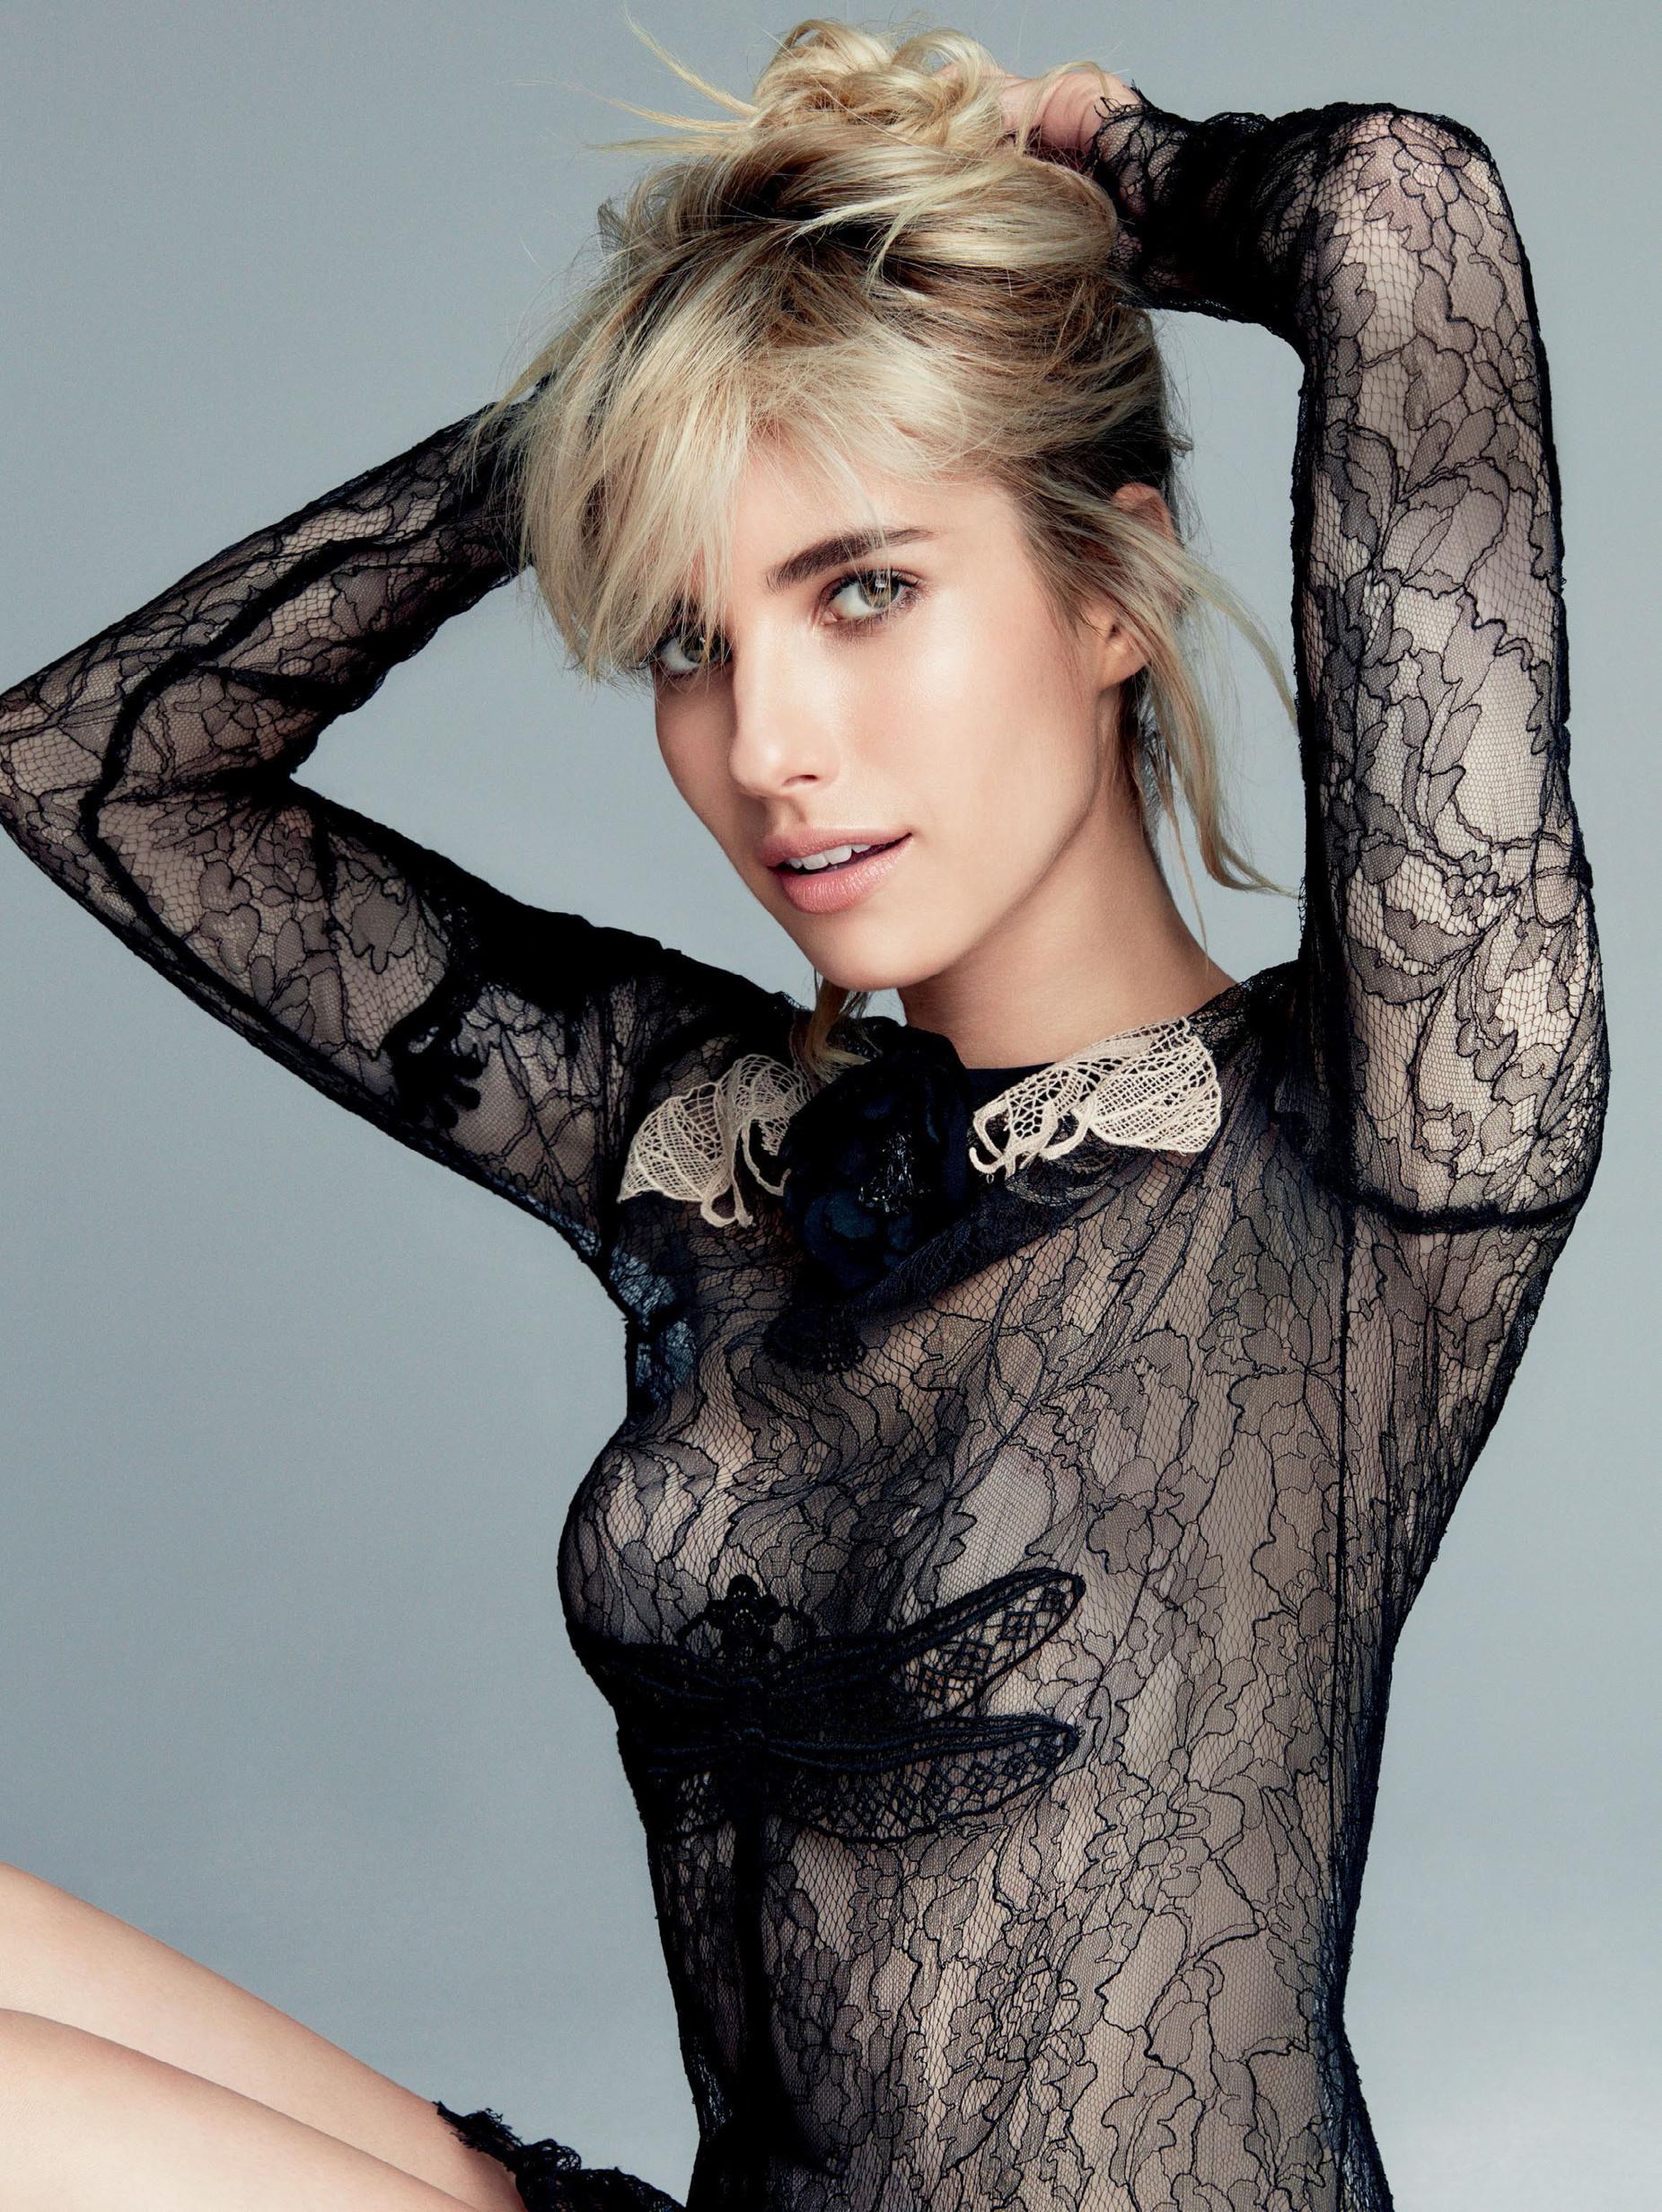 emma-roberts-sexy-photos